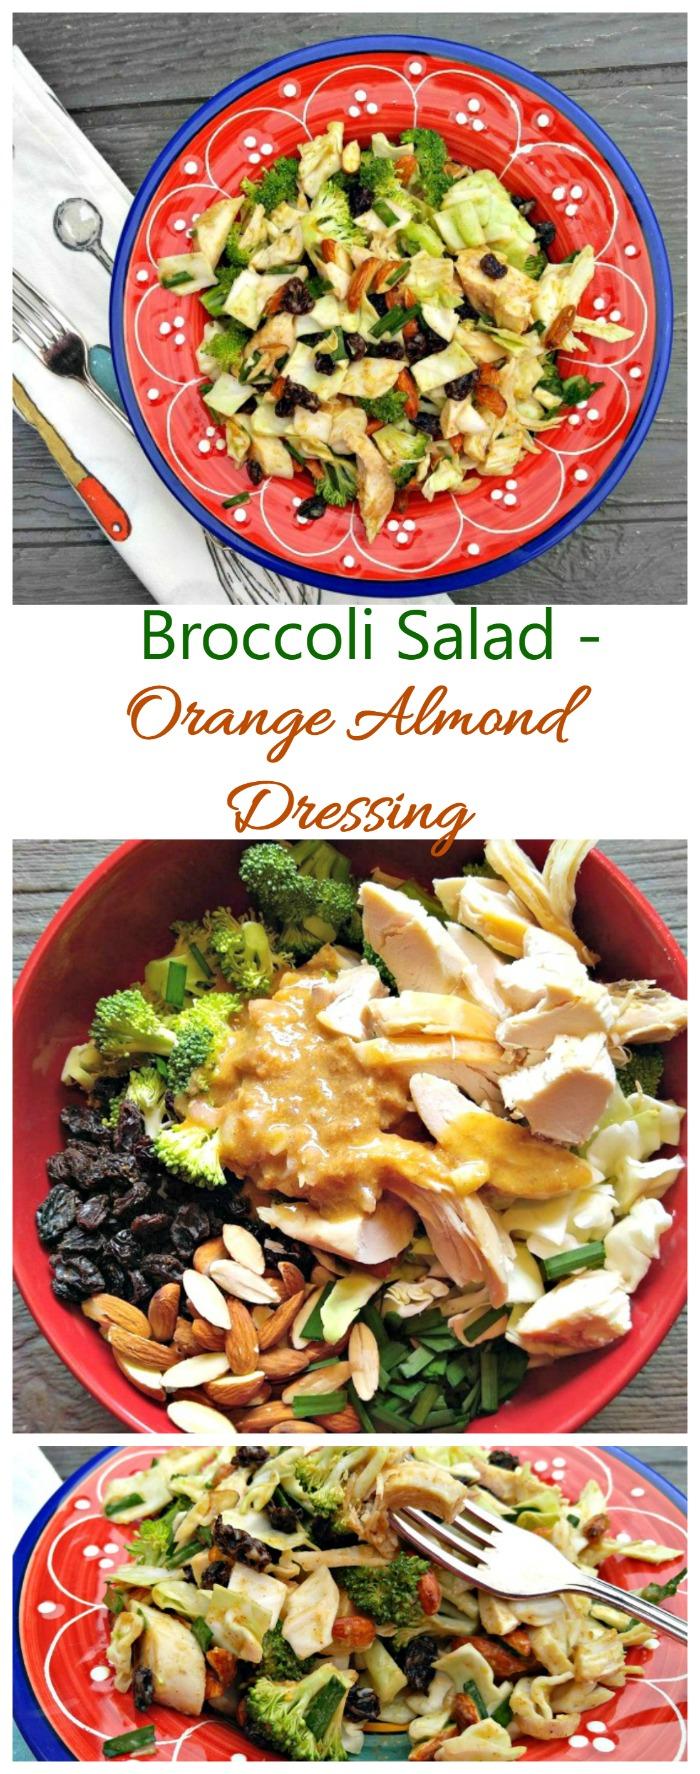 Broccoli Salad with Orange Almond Dressing